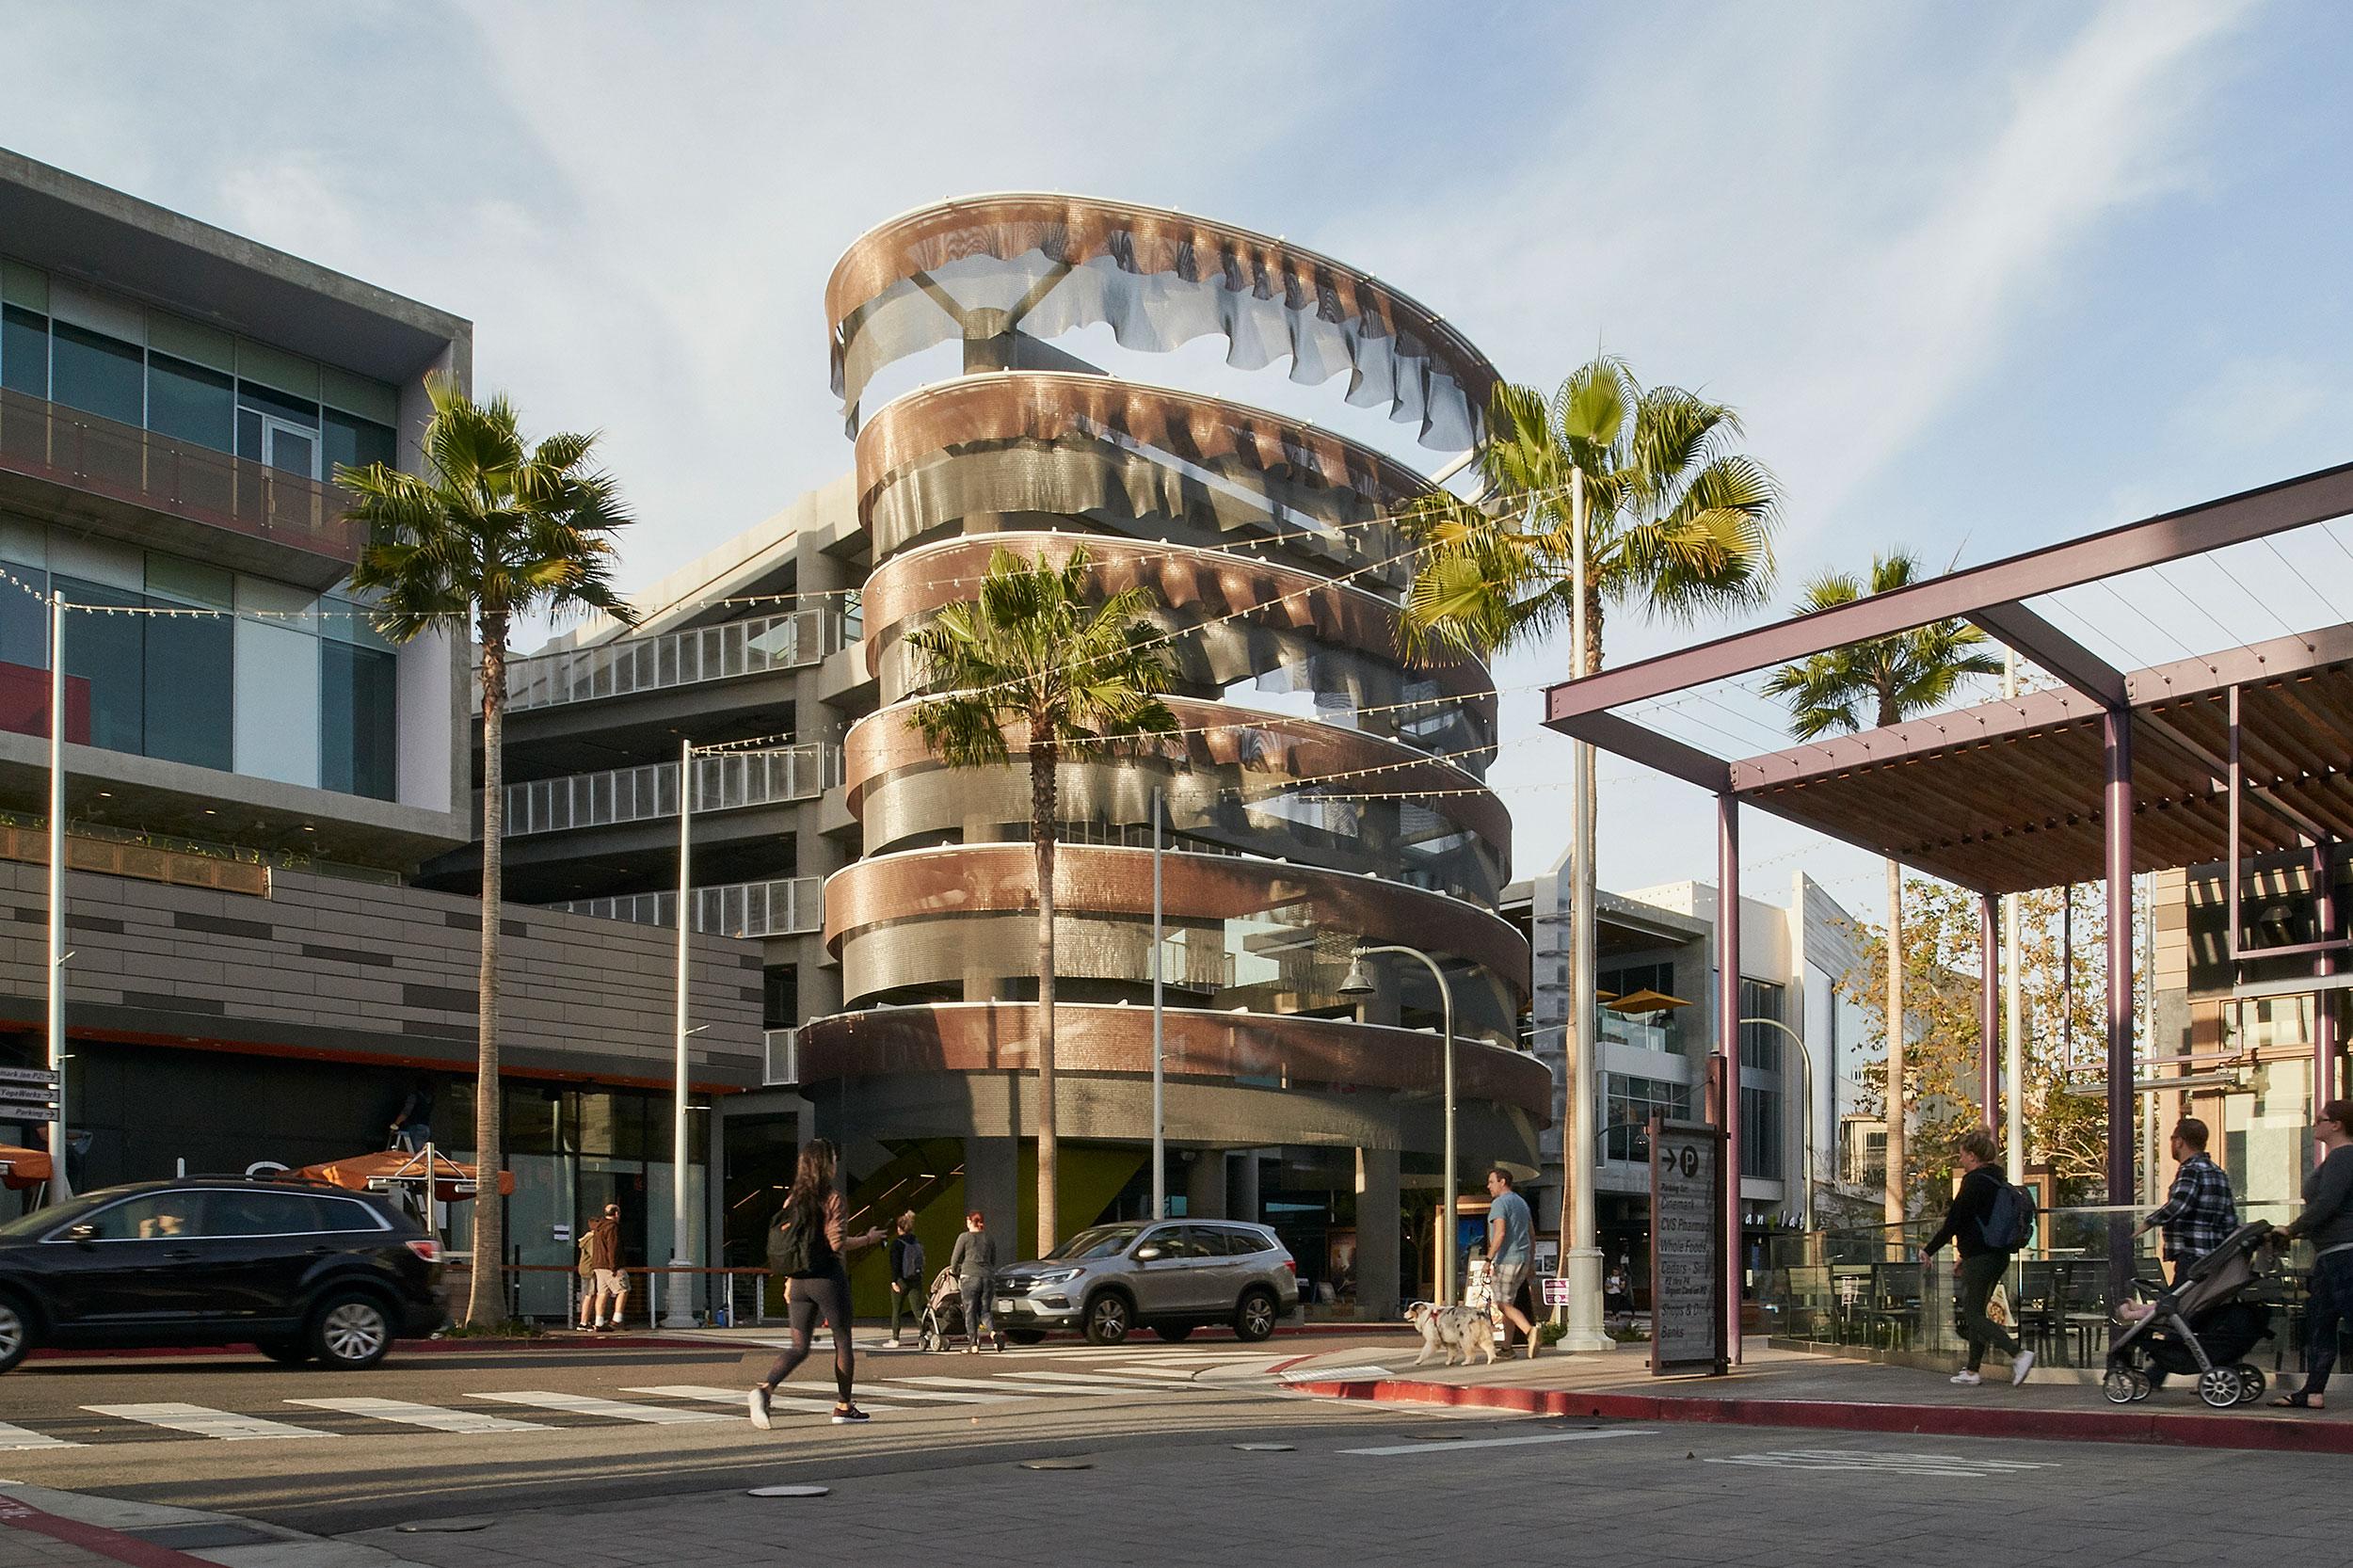 Enagua Plaza at Playa Vista Parking Garage Los Angeles